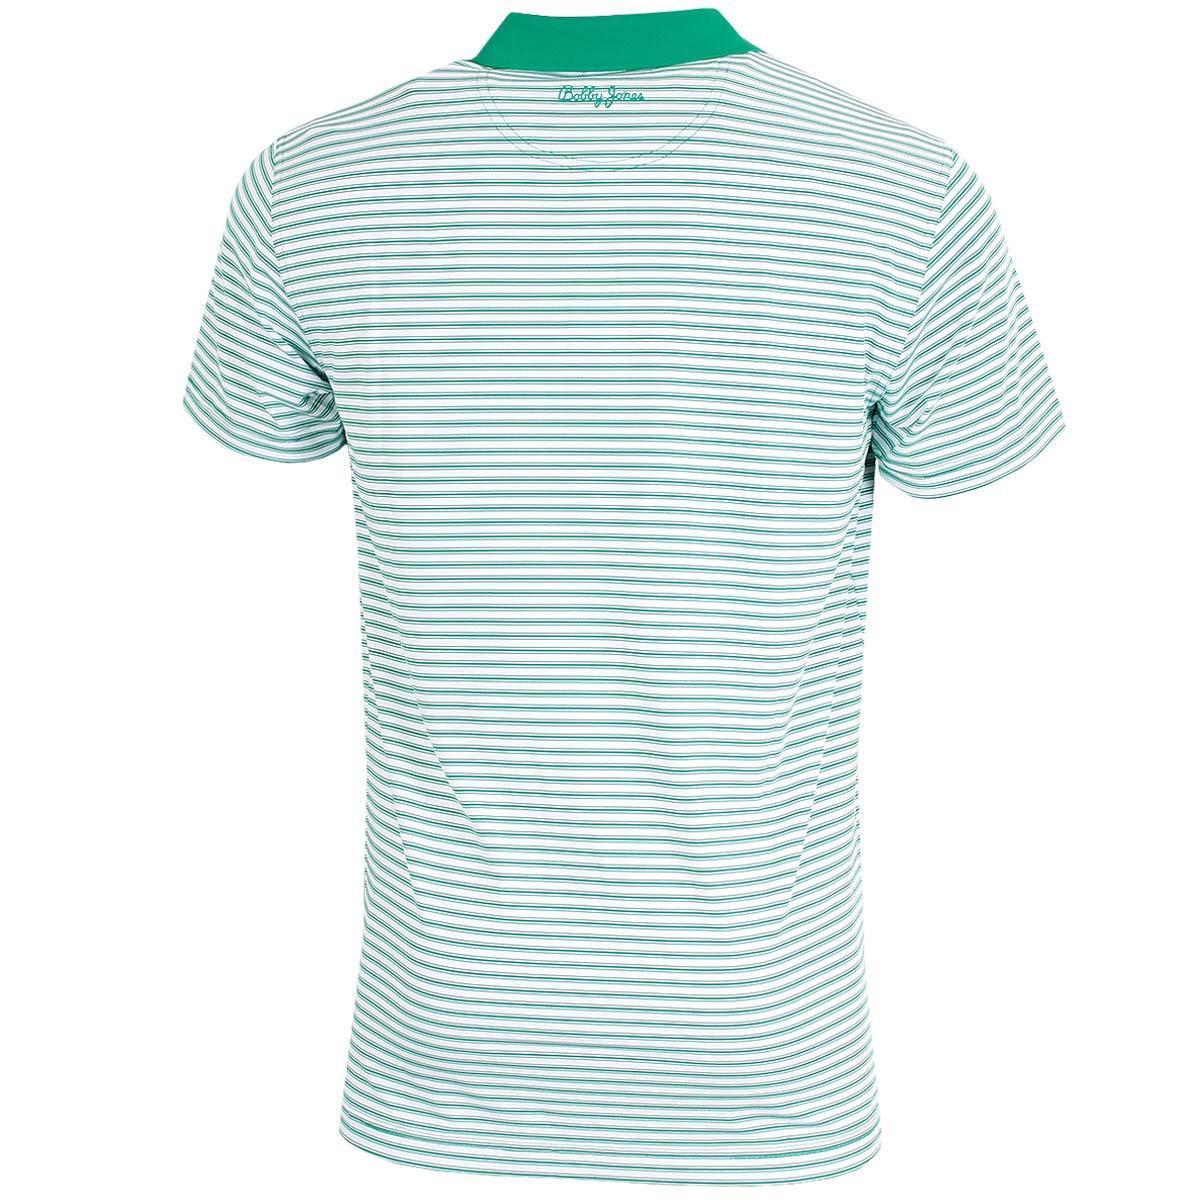 Bobby-Jones-Mens-XH20-Frame-Stripe-European-Fit-Golf-Polo-Shirt-72-OFF-RRP thumbnail 8